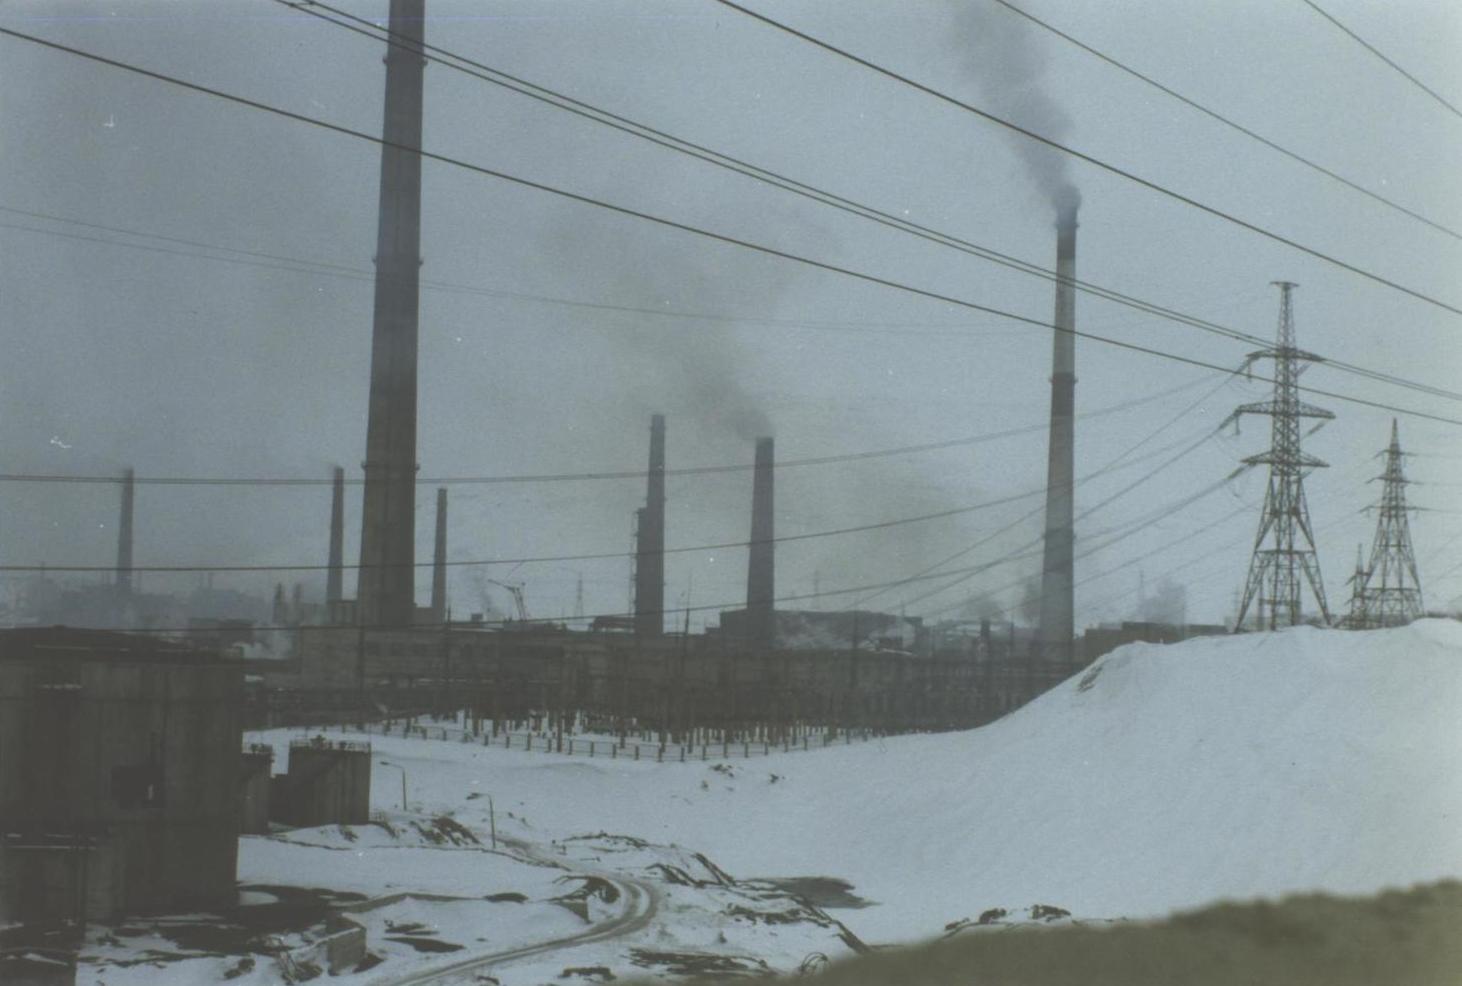 The Severonikel Kombinat nickel and copper plant at Monchegorsk, Kola Peninsula, Russia. (JAMES FLINT)